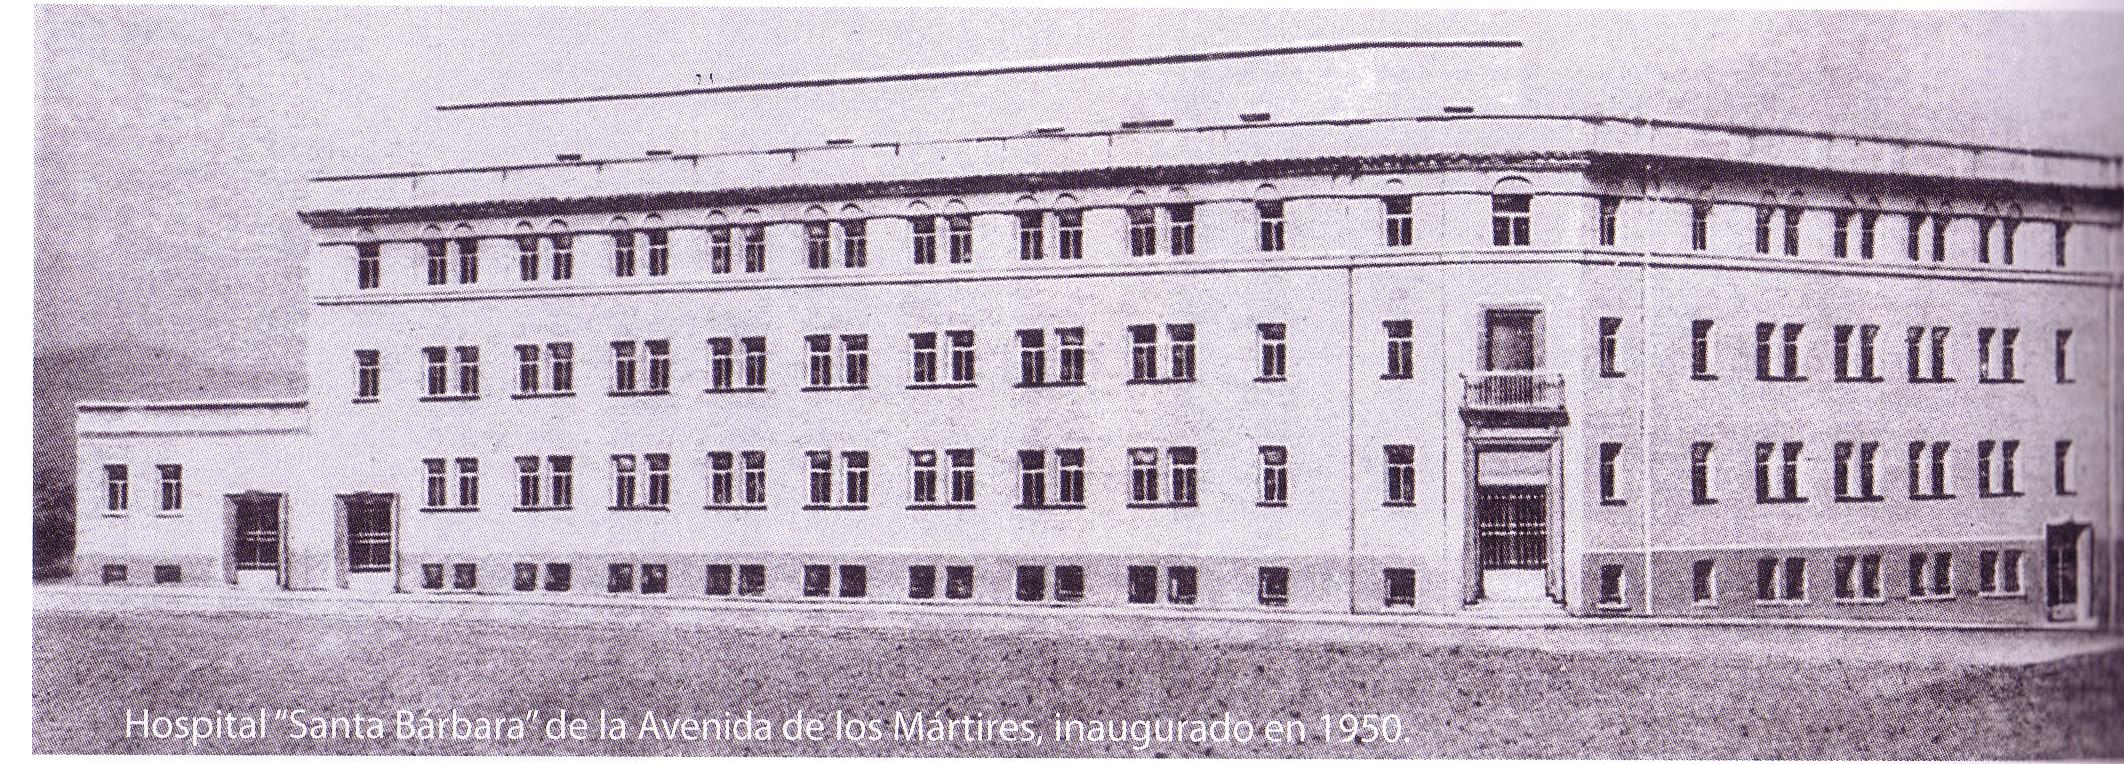 Hospital Santa Bárbara 1950